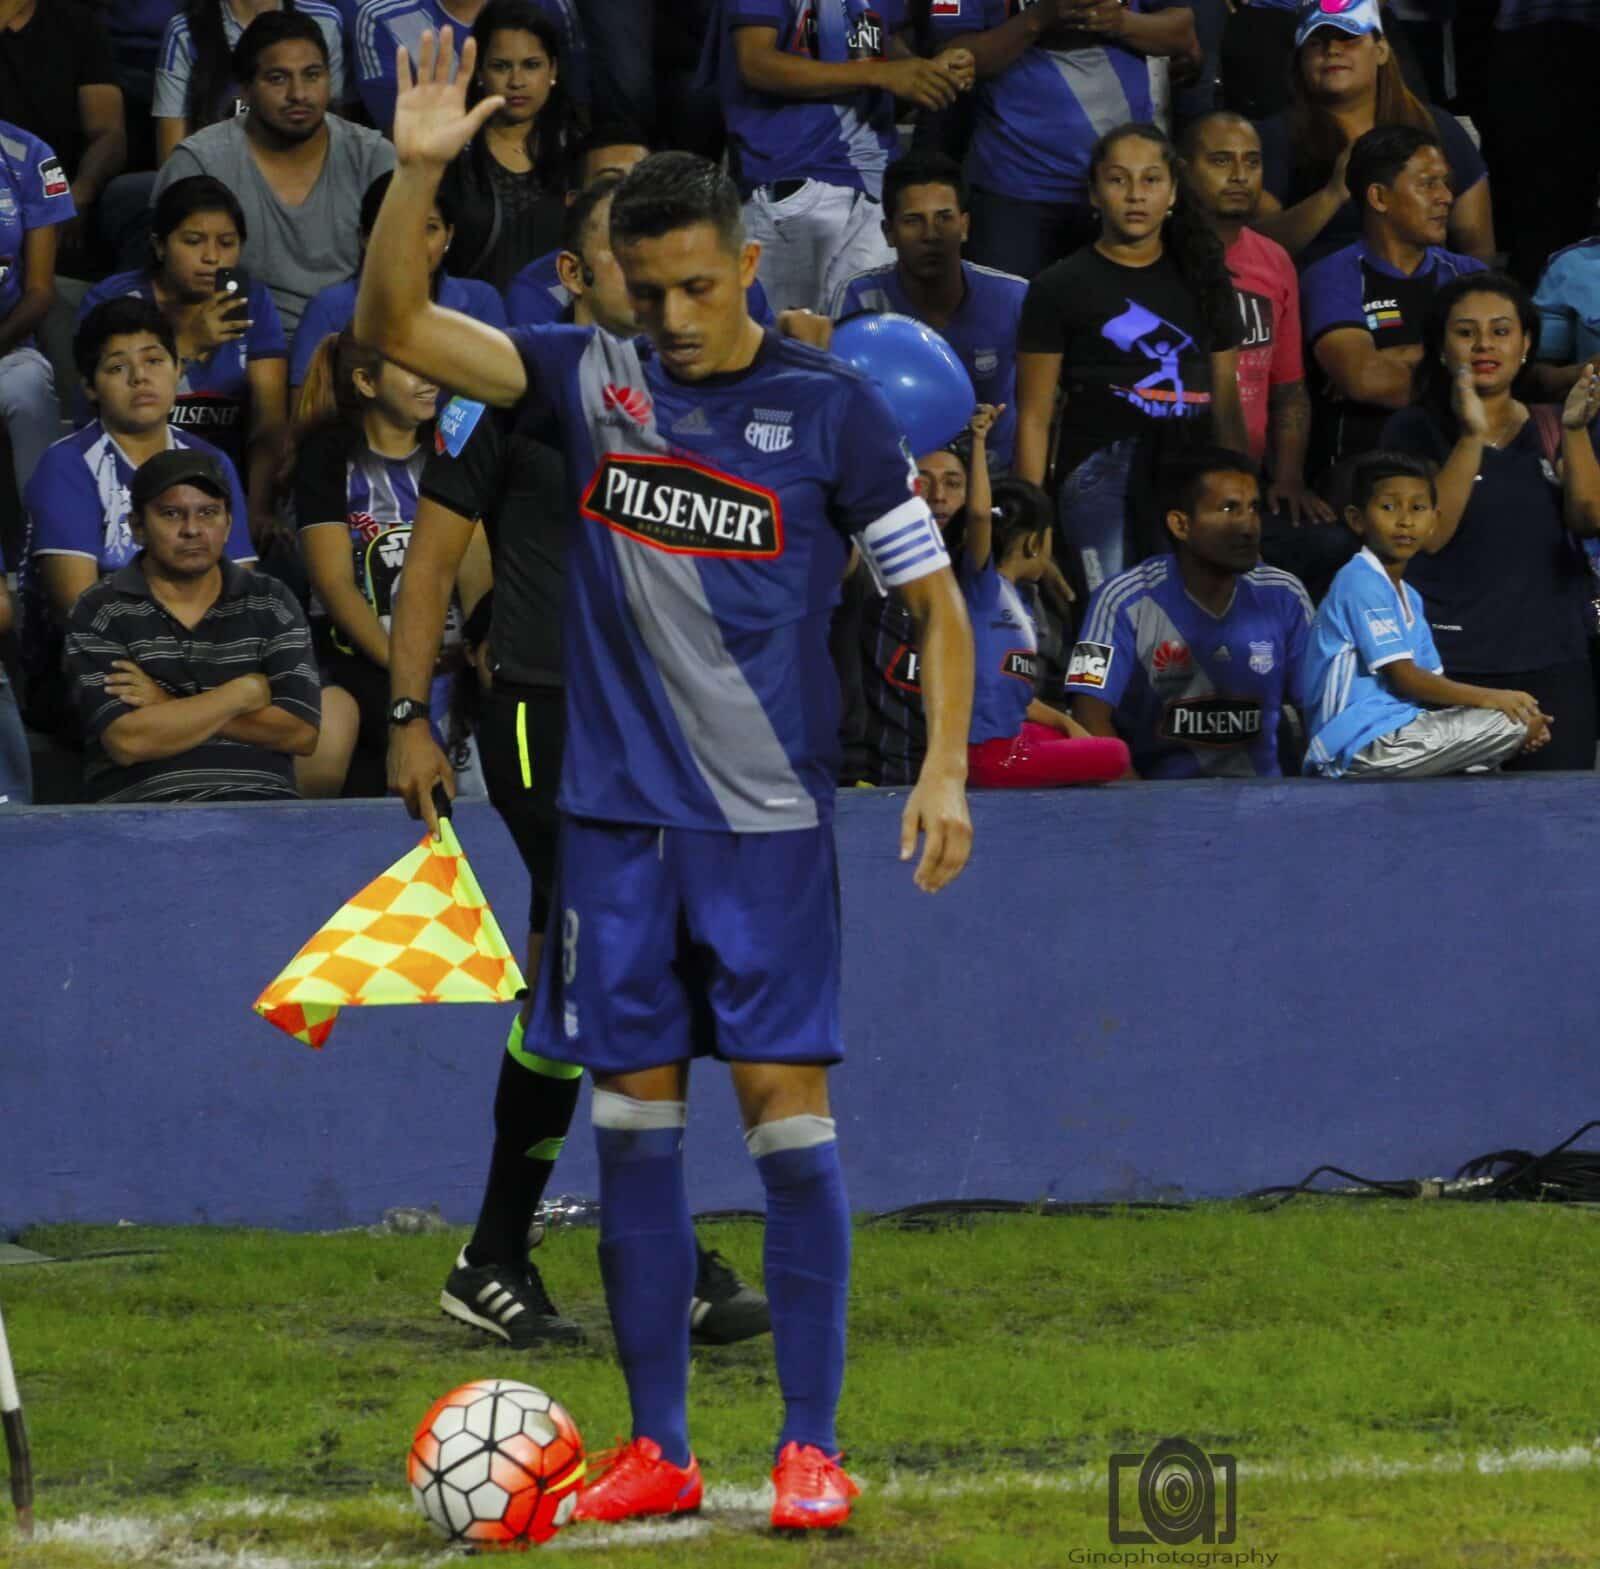 Fotos EMELEC 1 vs 0 Fuerza Amarilla por Gino Garcés